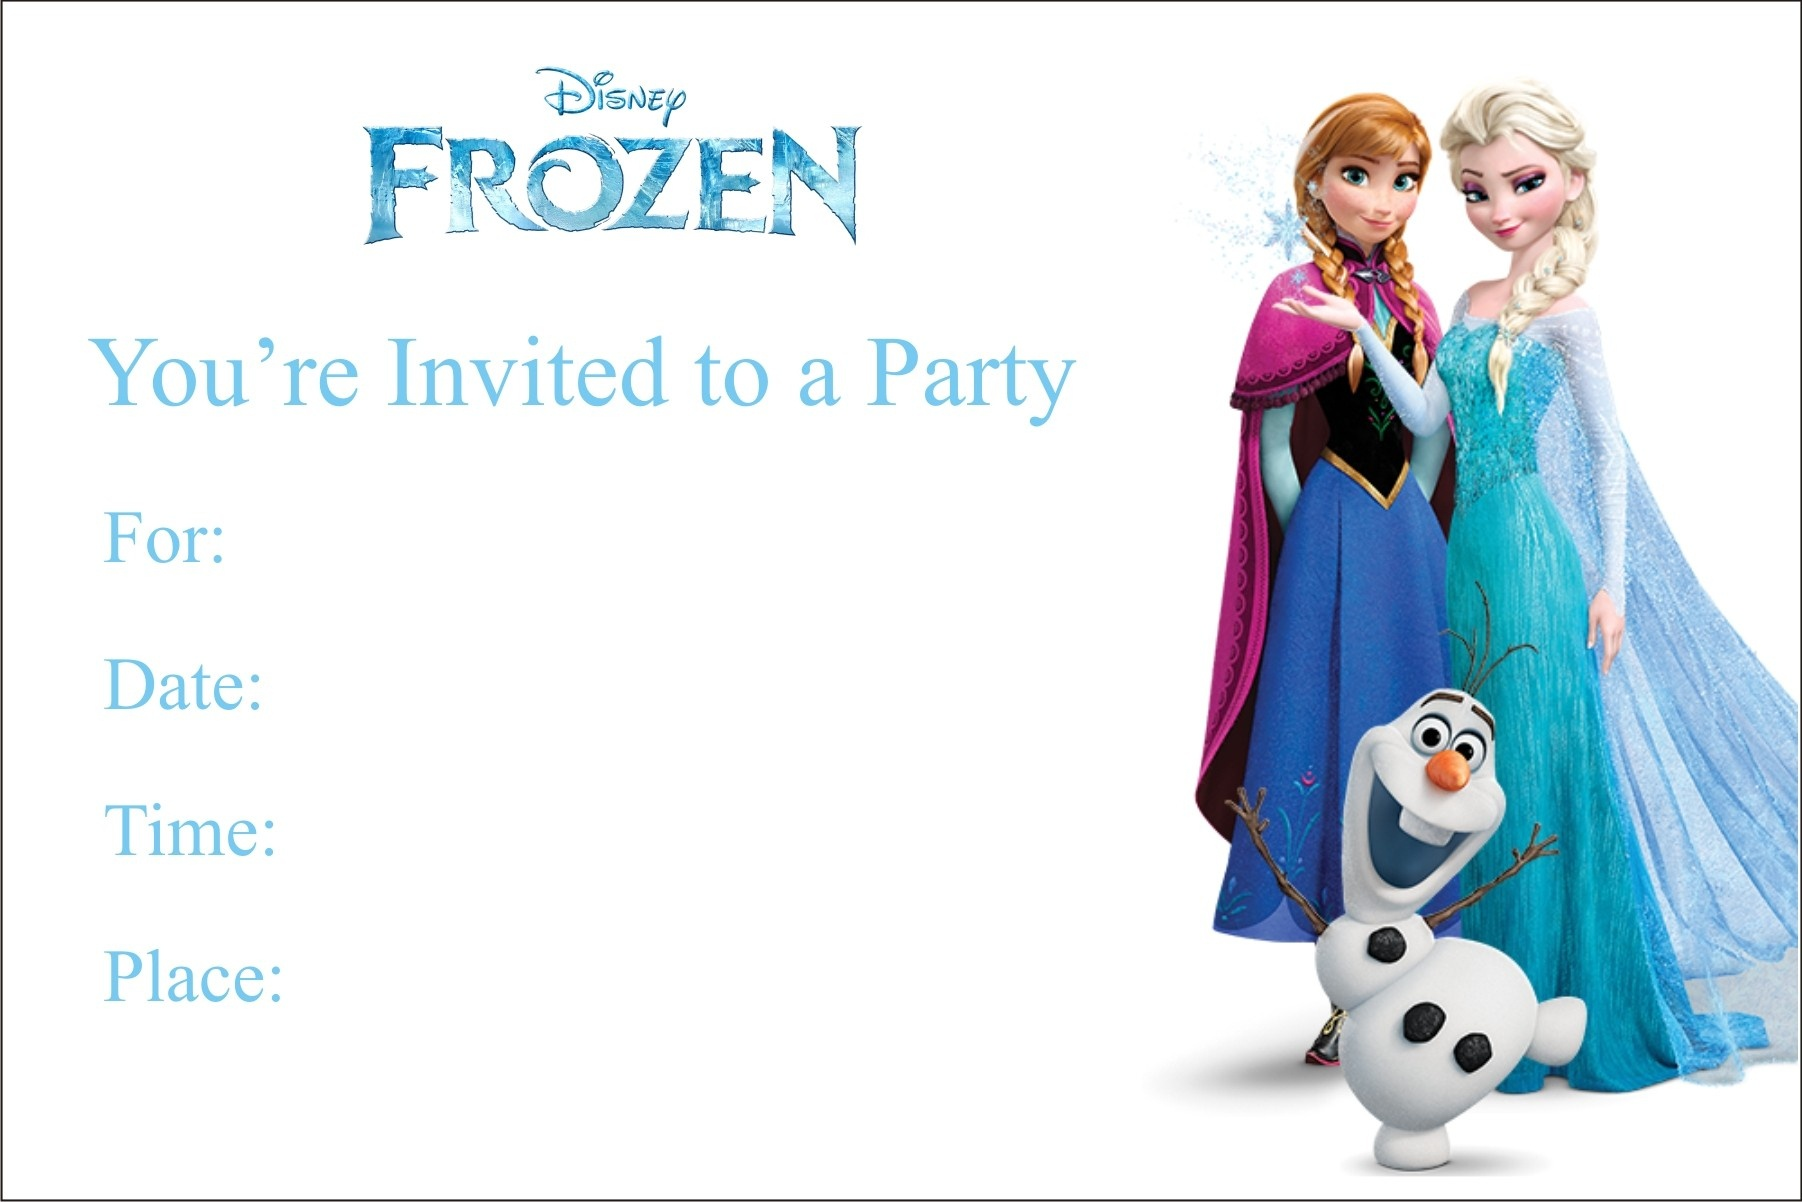 Frozen Free Printable Birthday Party Invitation Personalized Party - Free Printable Frozen Birthday Invitations